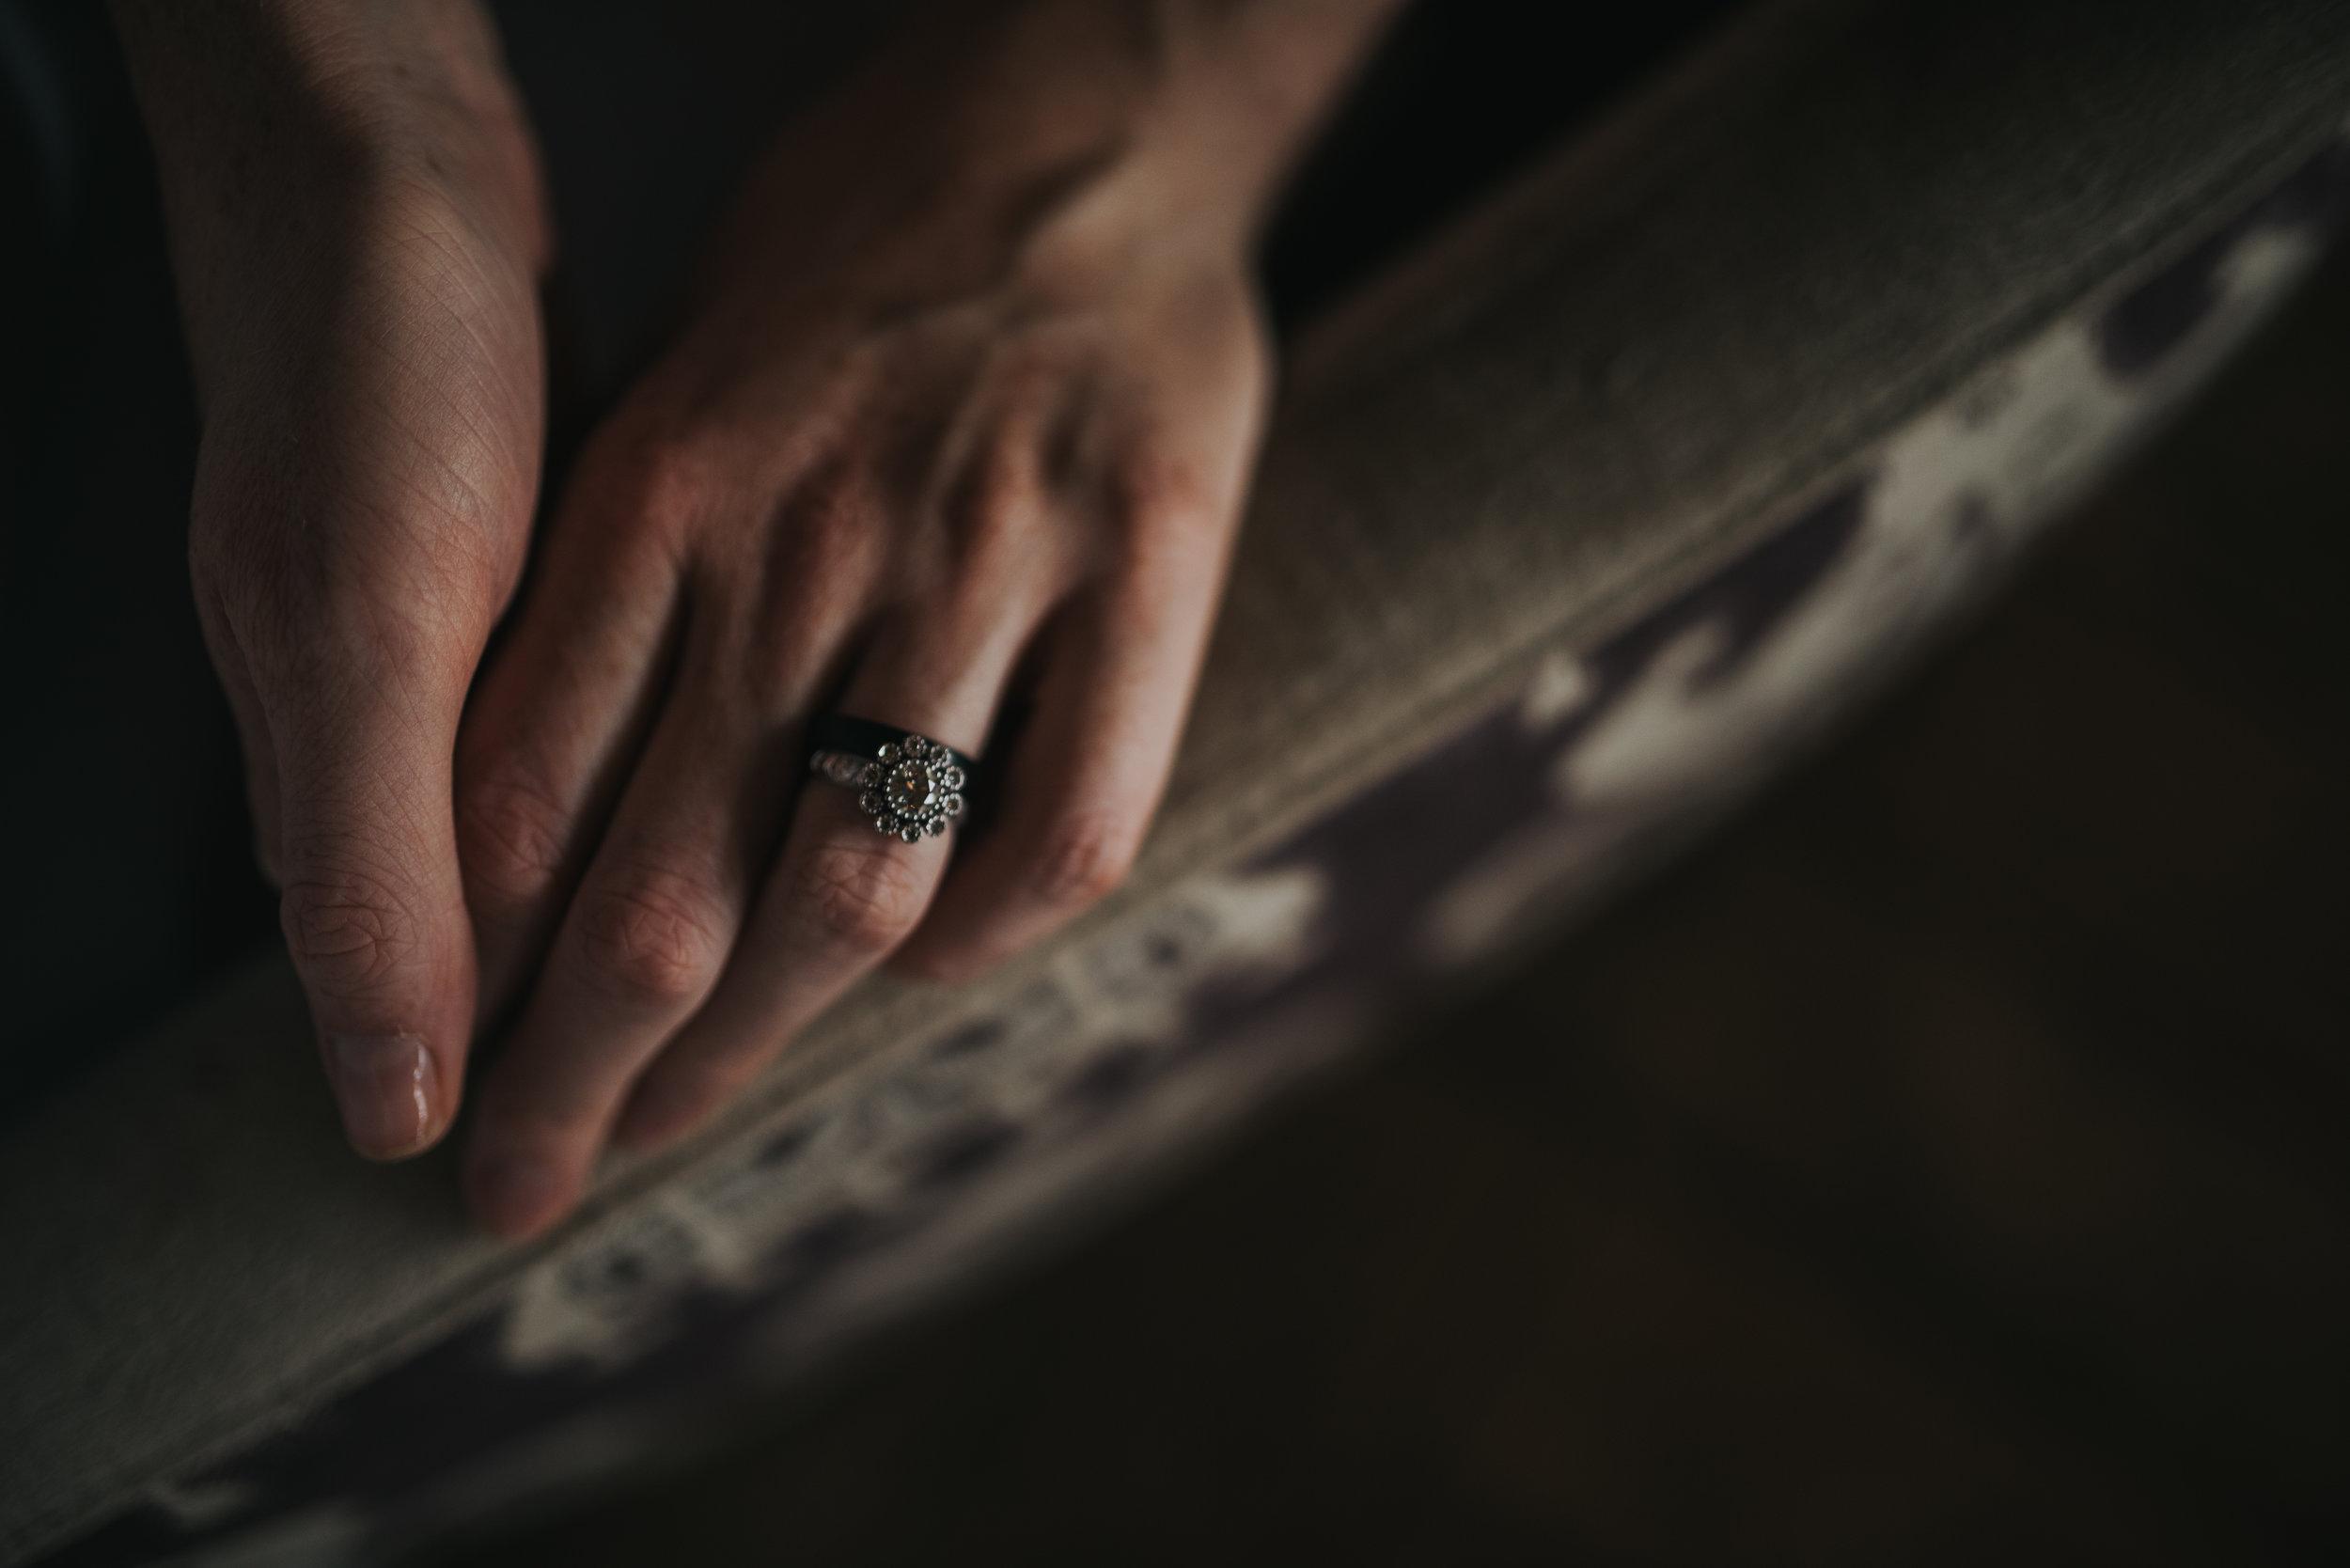 bride-wedding-ring-toronto-outdoor-summer-wedding-documentary-wedding-photography-by-willow-birch-photo.jpg